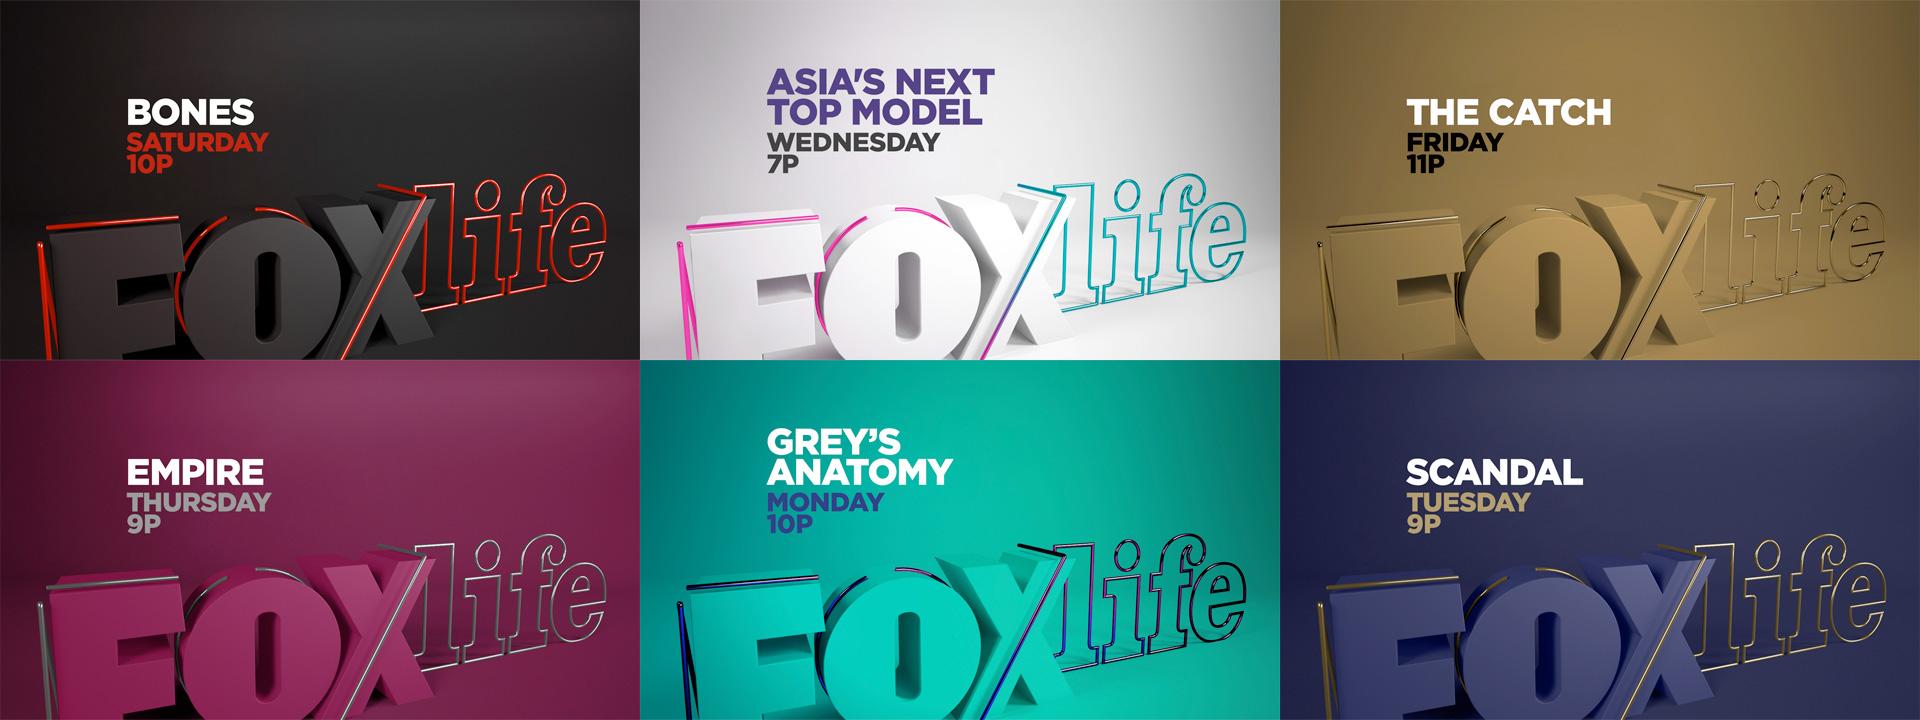 FOXlife_Web_13.jpg